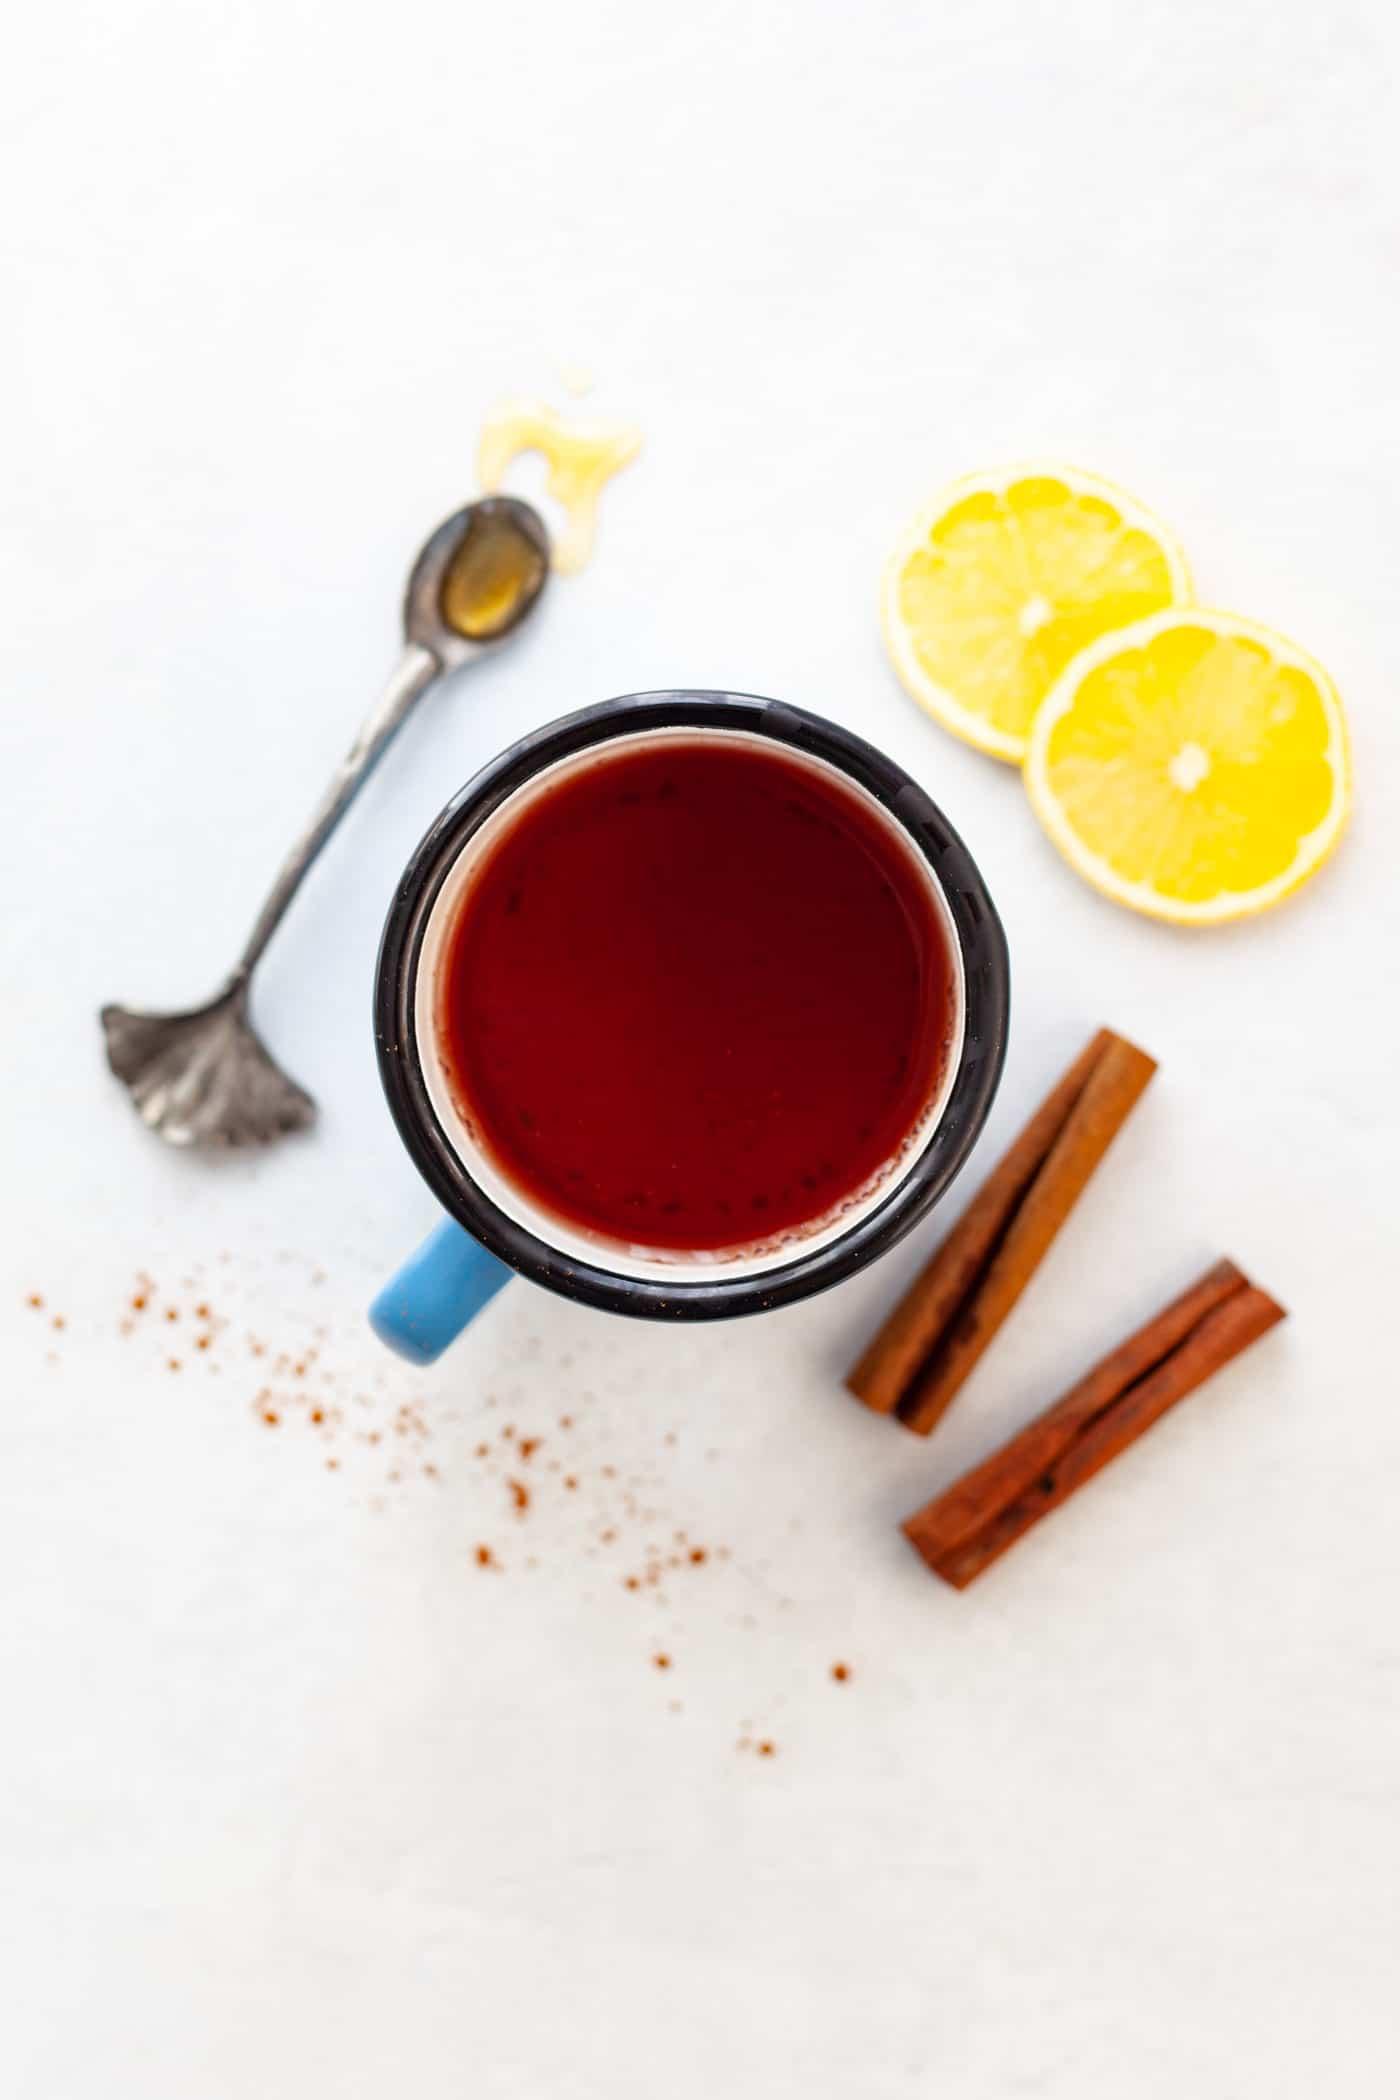 mug of cinnamon tea surrounded by cinnamon sticks, lemon and honey